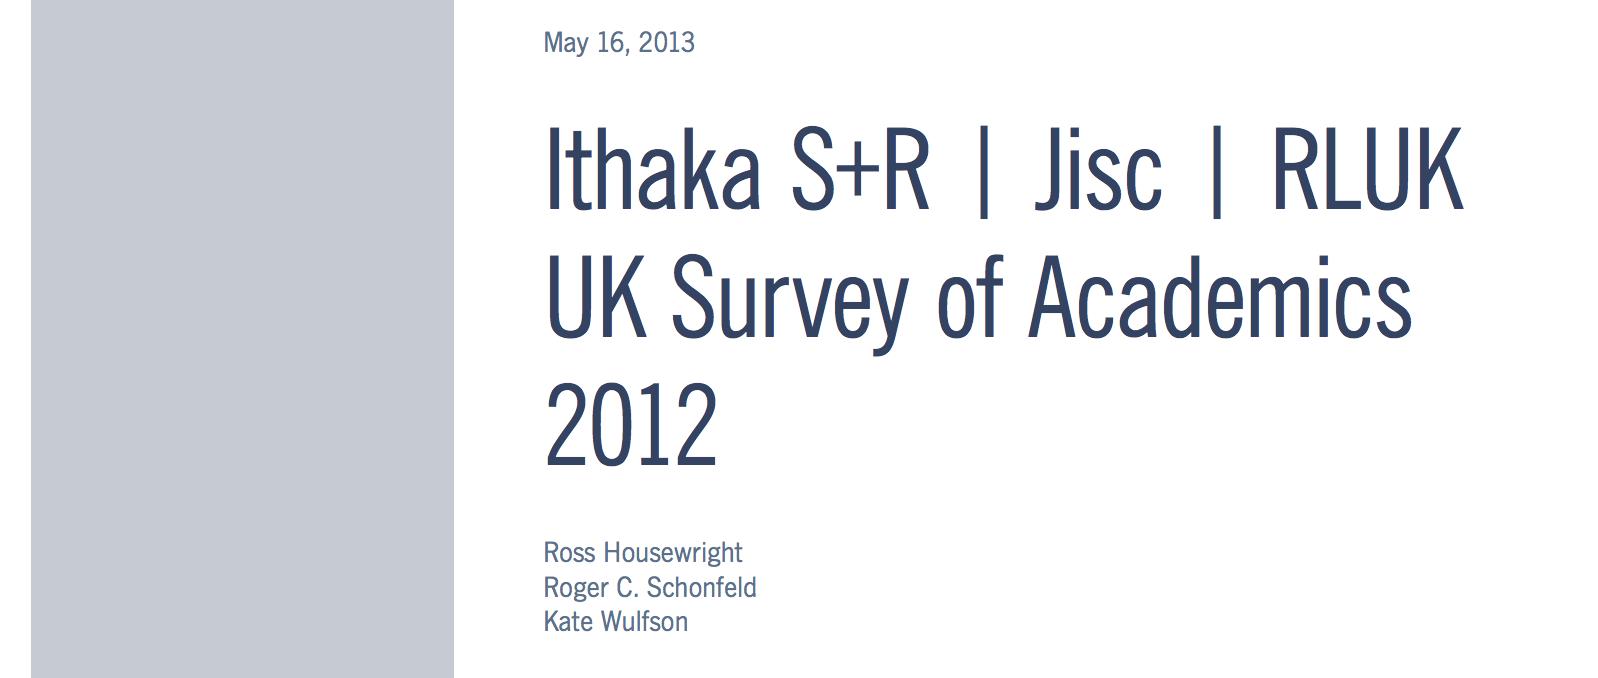 UK Survey of Academics 2012